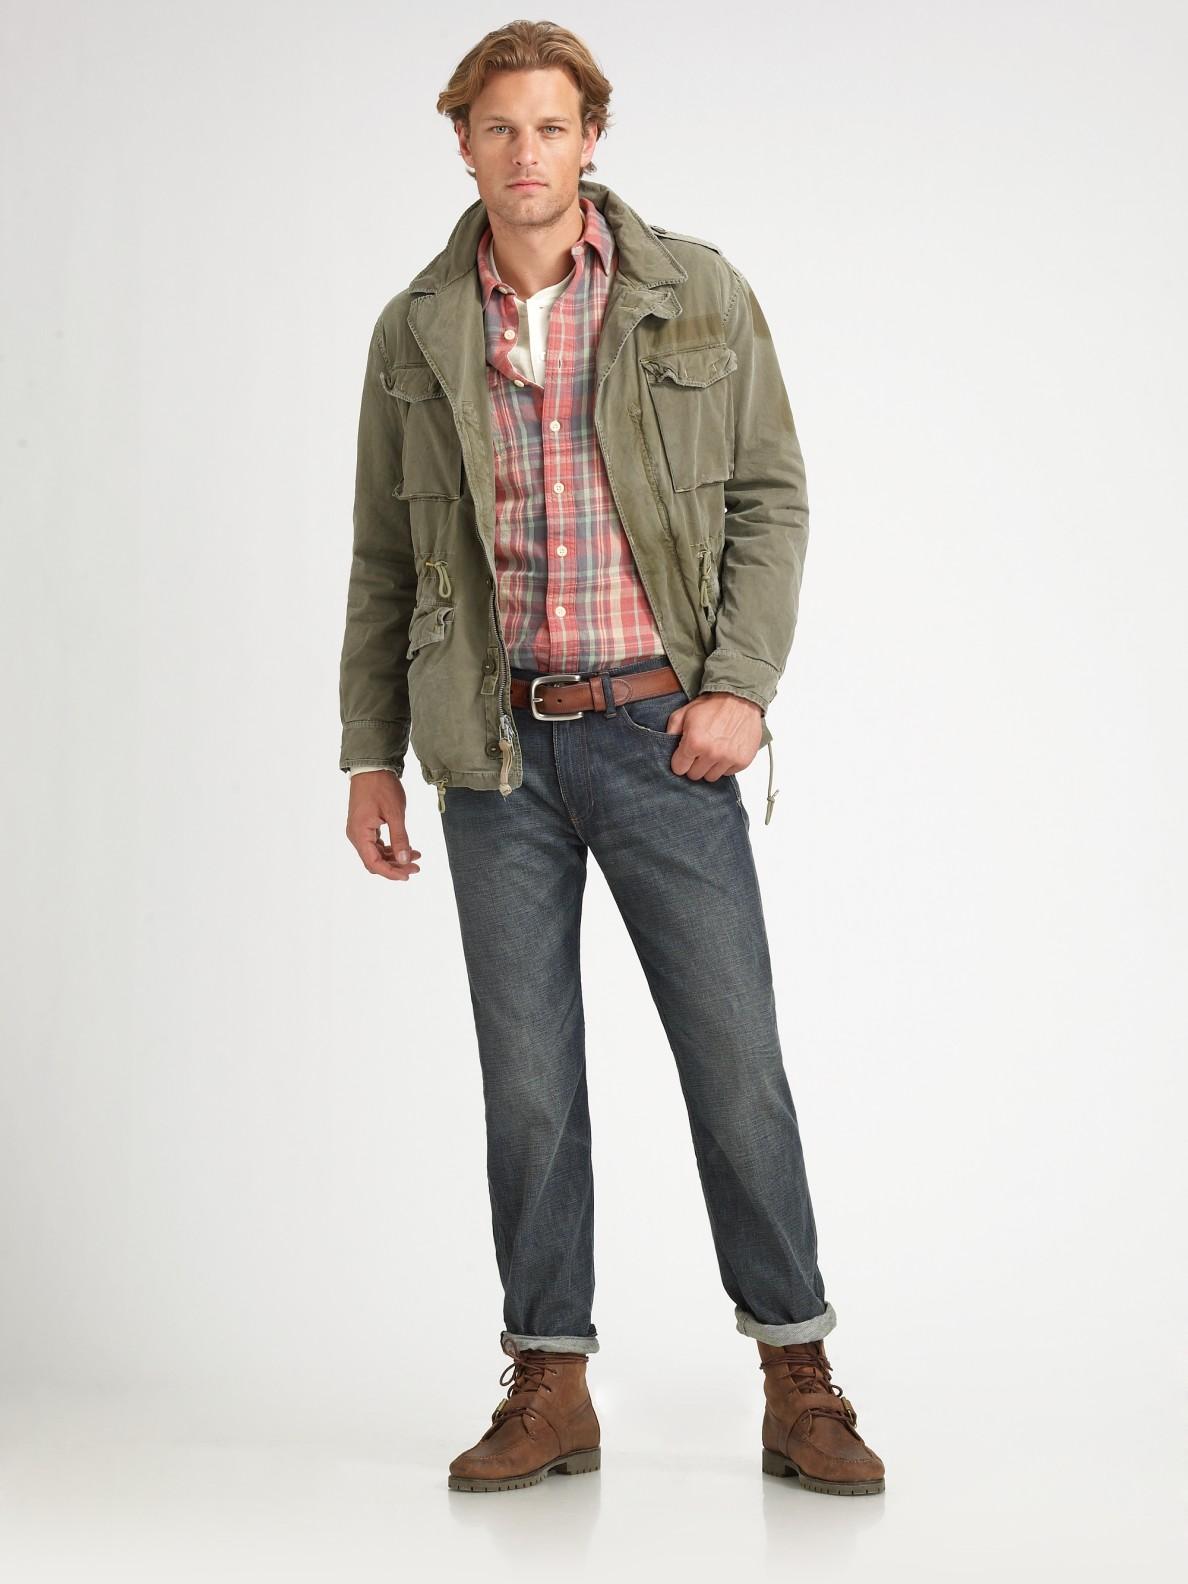 Lyst Polo Ralph Lauren Military Combat Jacket In Green